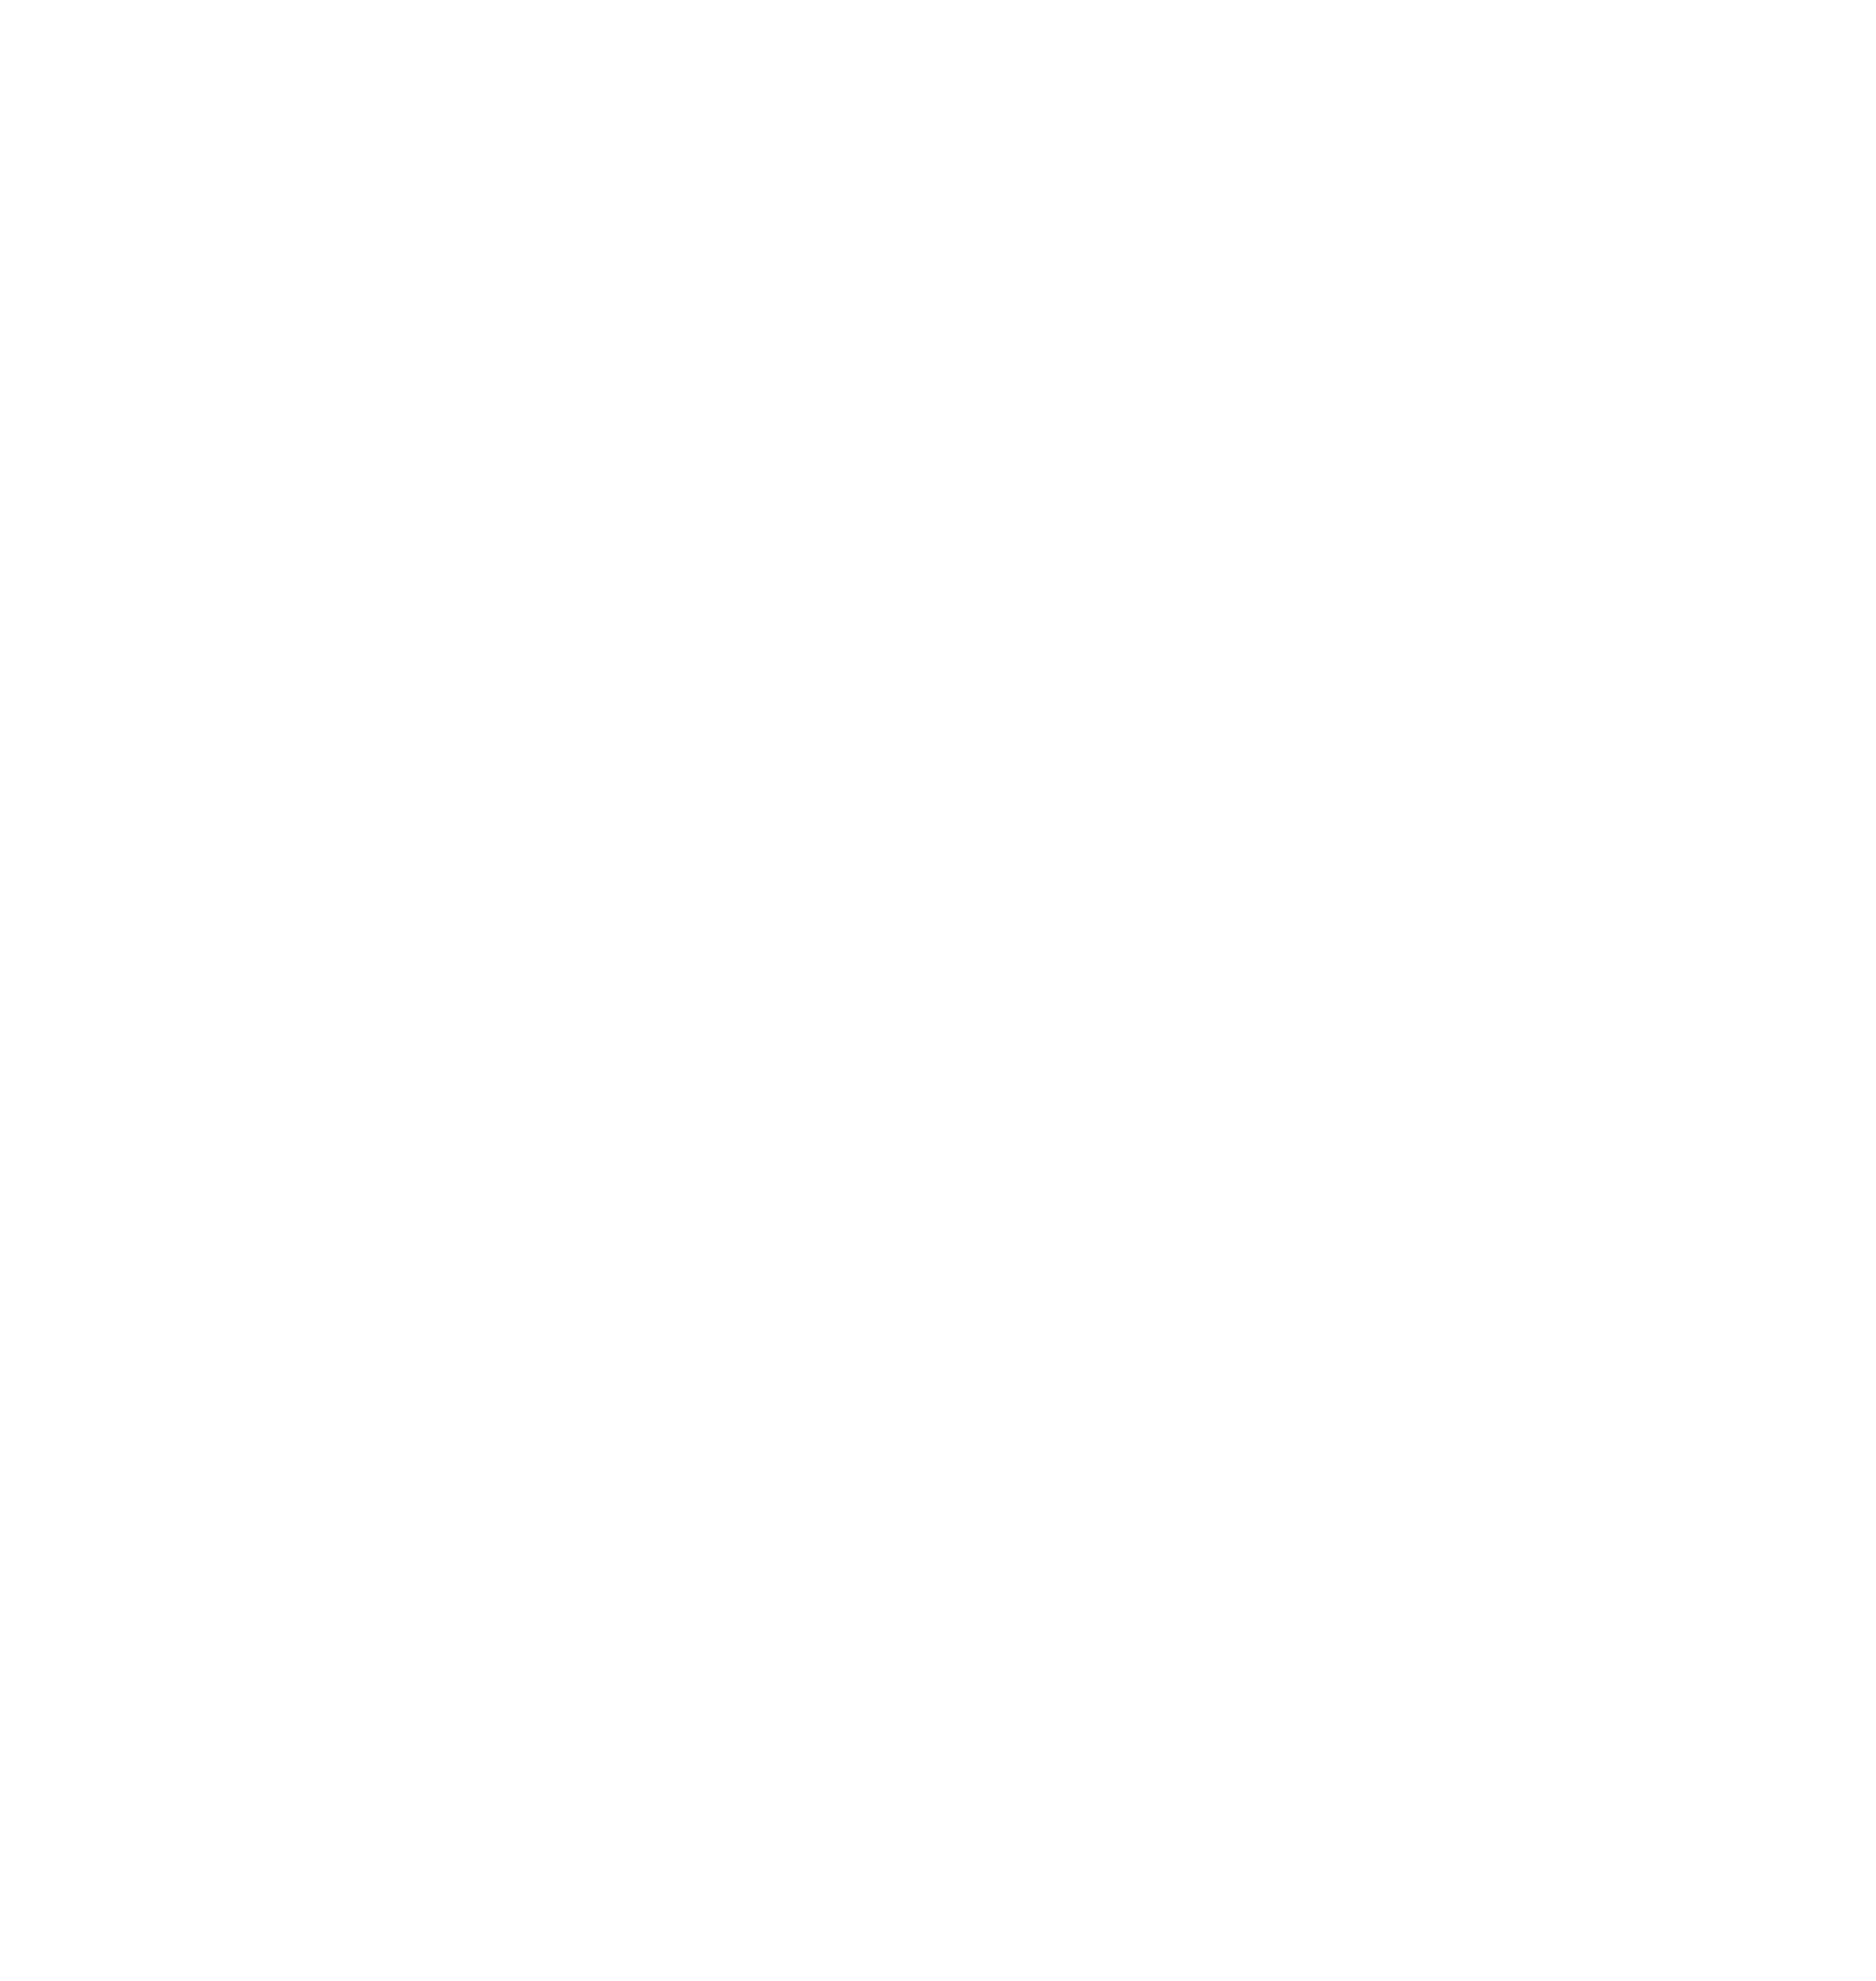 White Floral Corner PNG Clip Art.